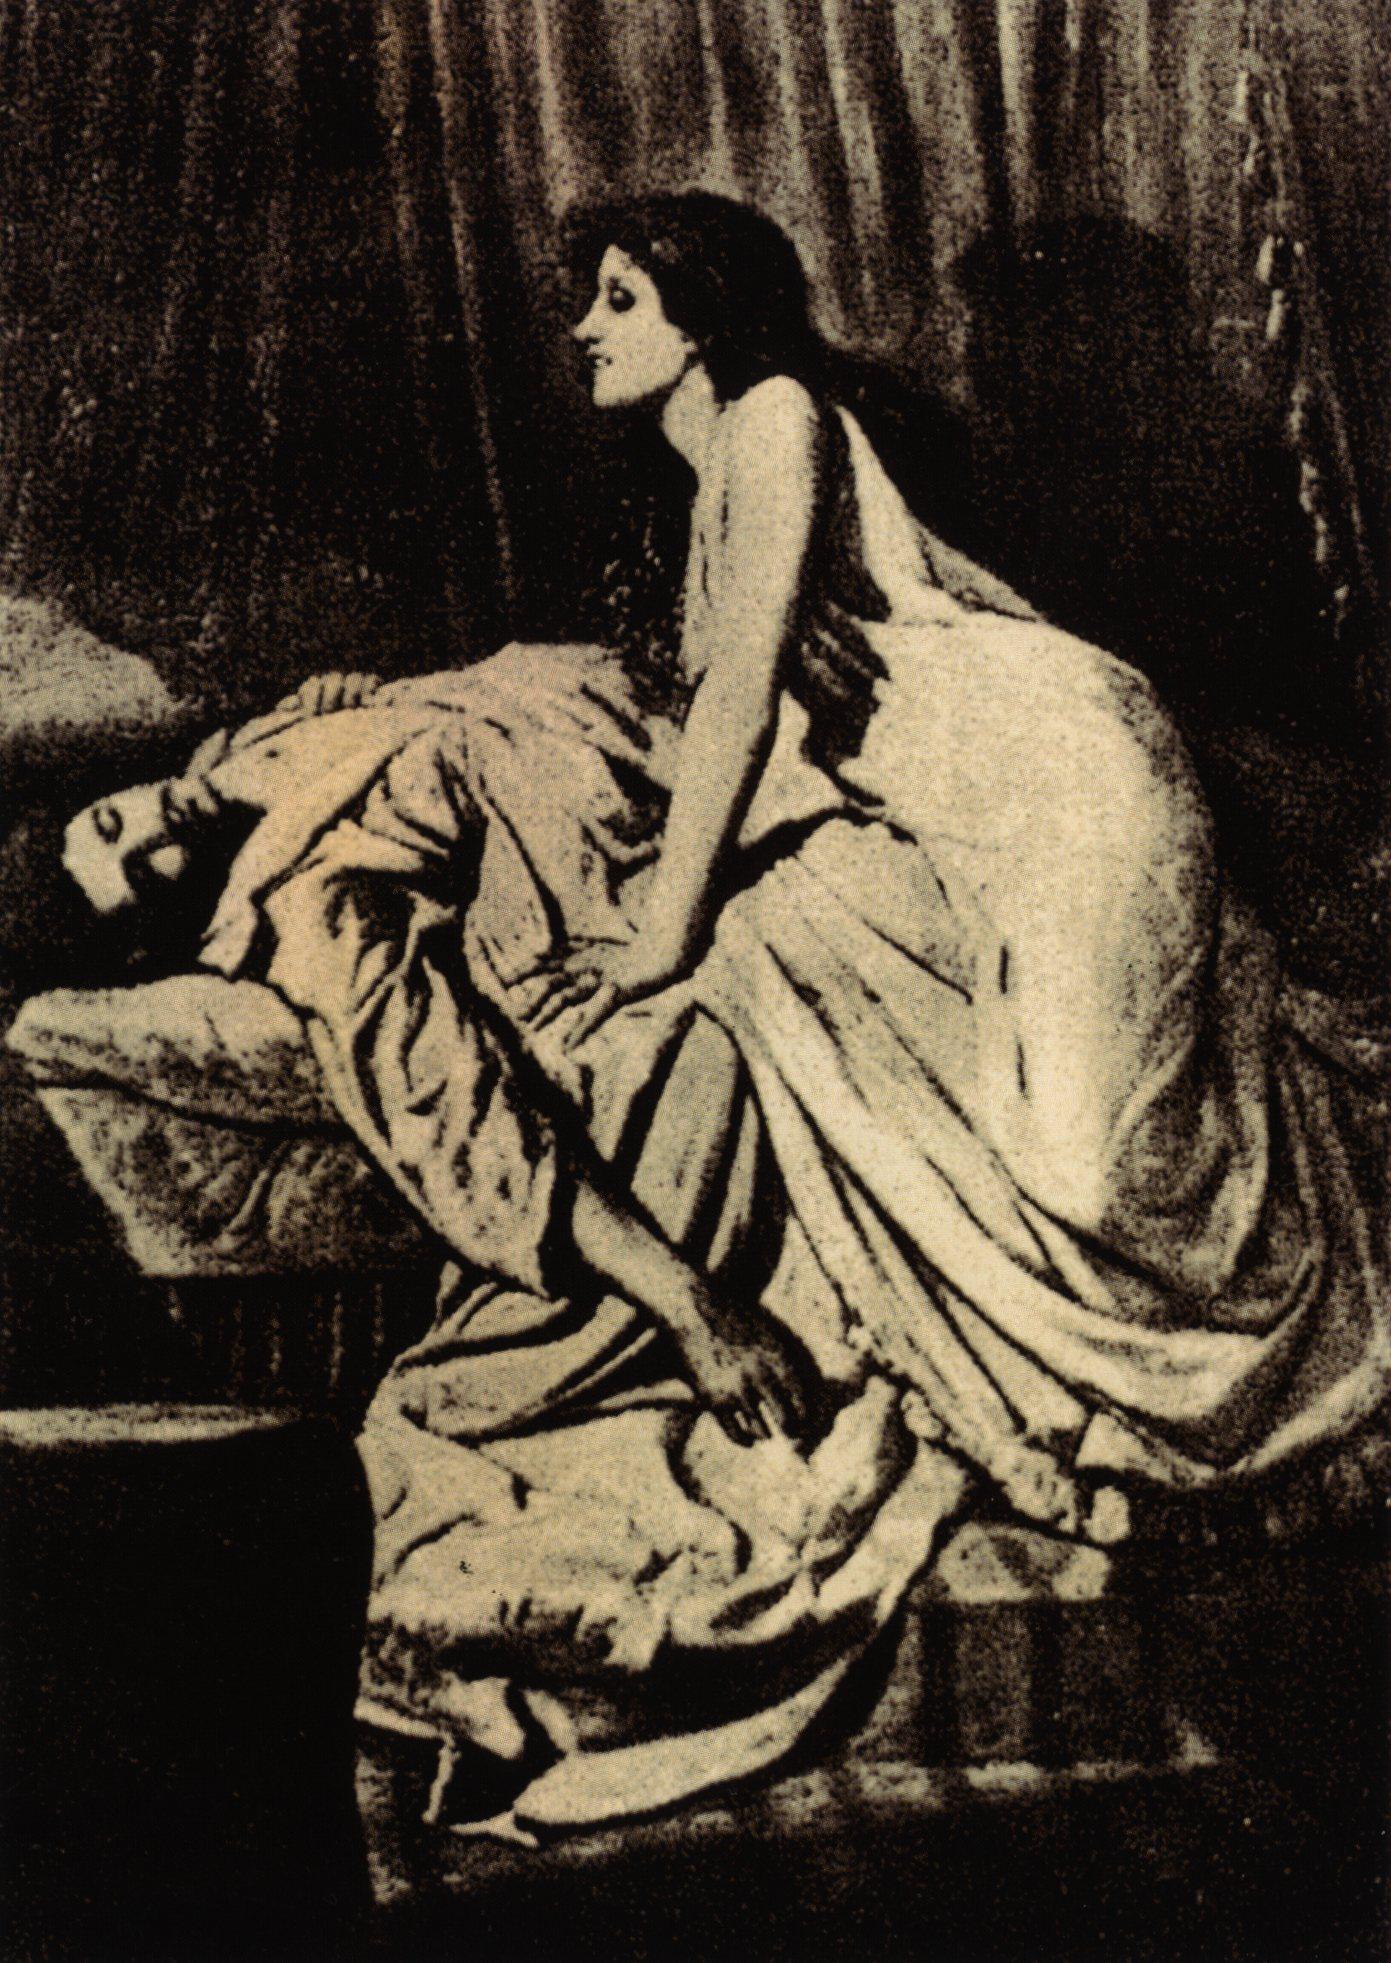 Philip Burne-Jones [Public domain], via Wikimedia Commons